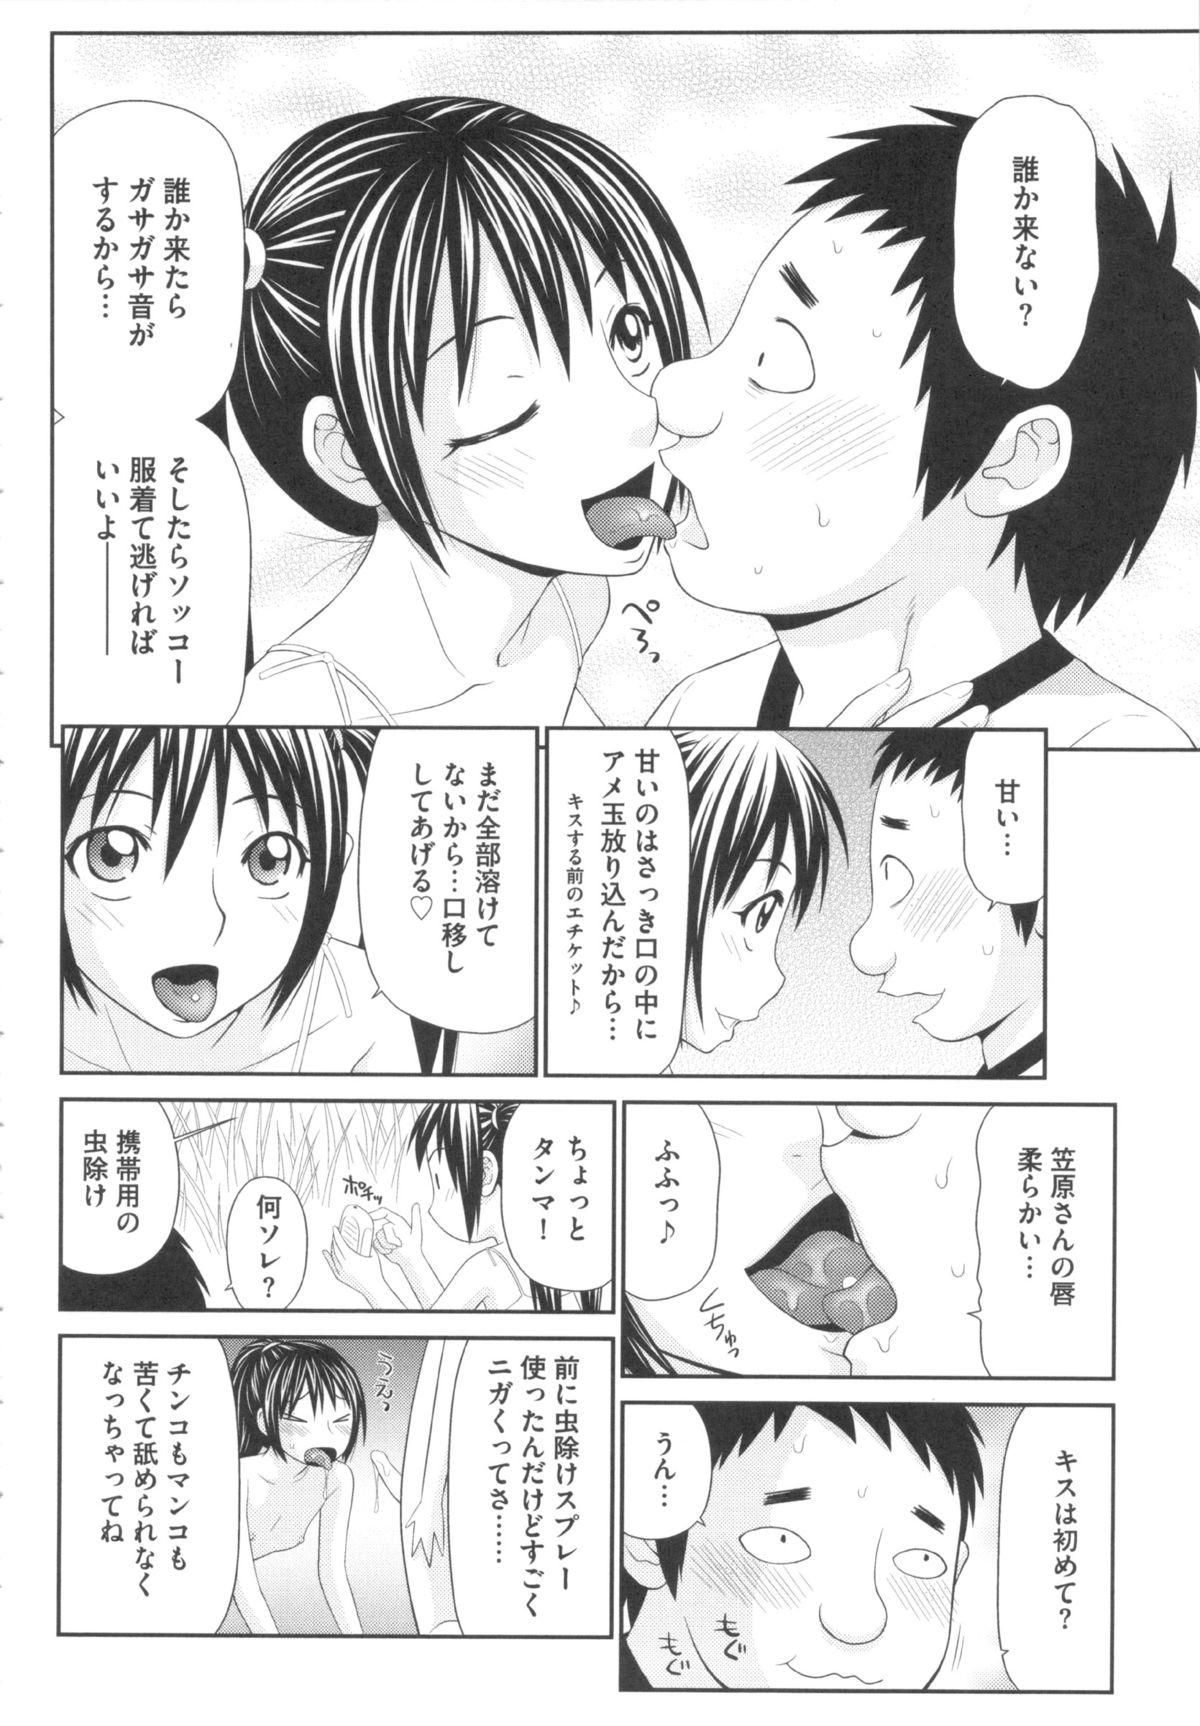 Kiseki No Zaajiru - Sperm of Miracle 128